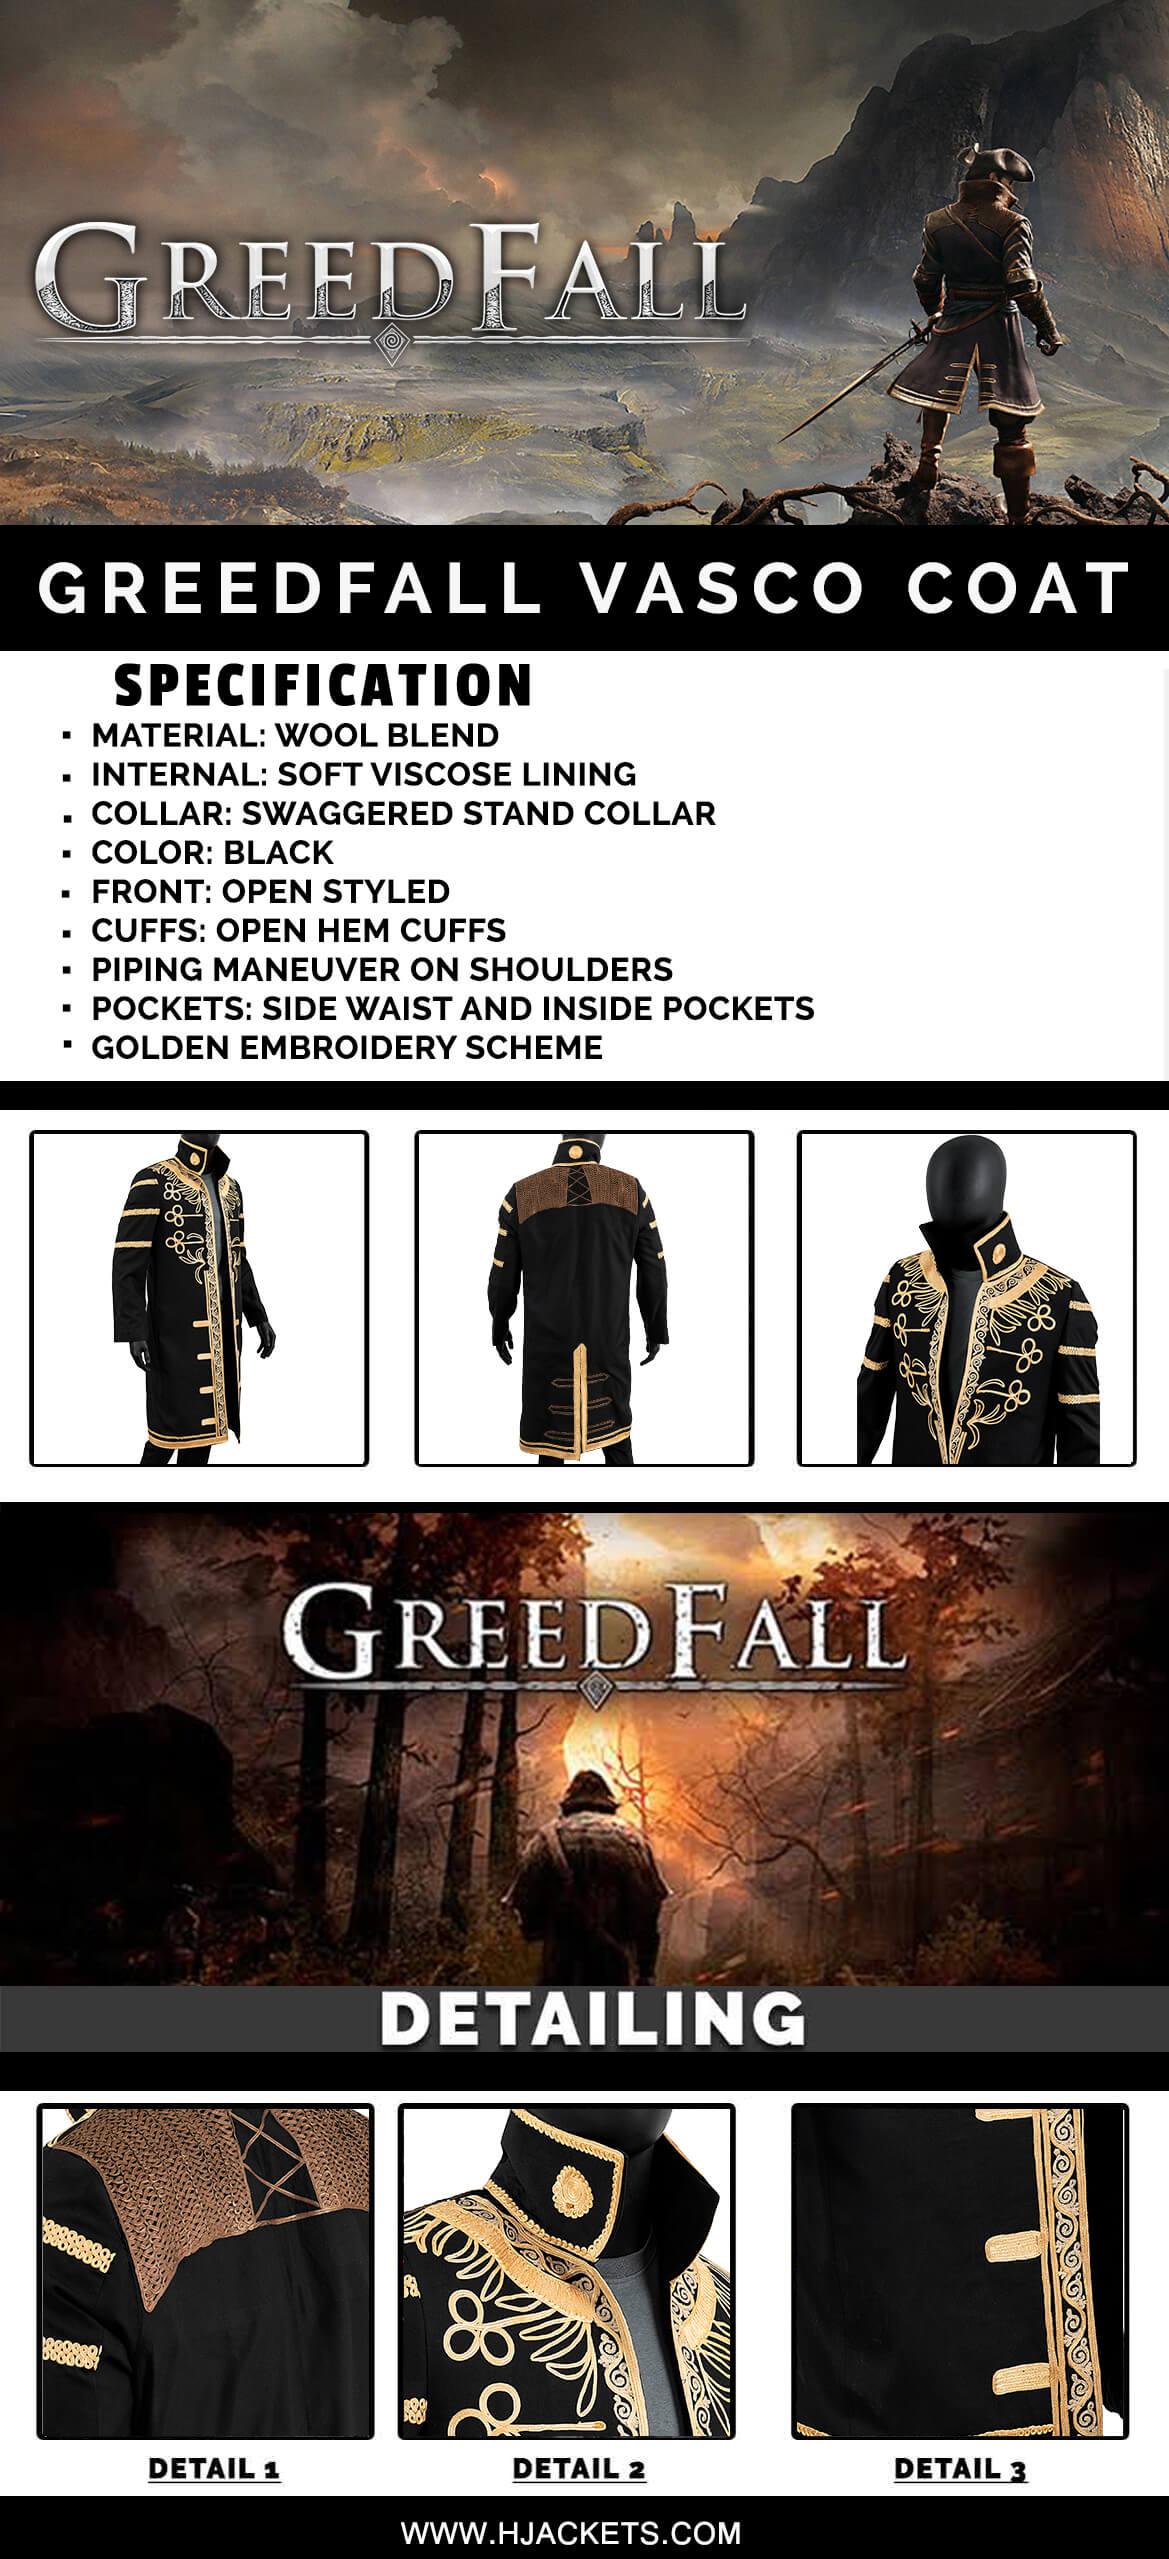 Greedfall-Vasco-Coat-2